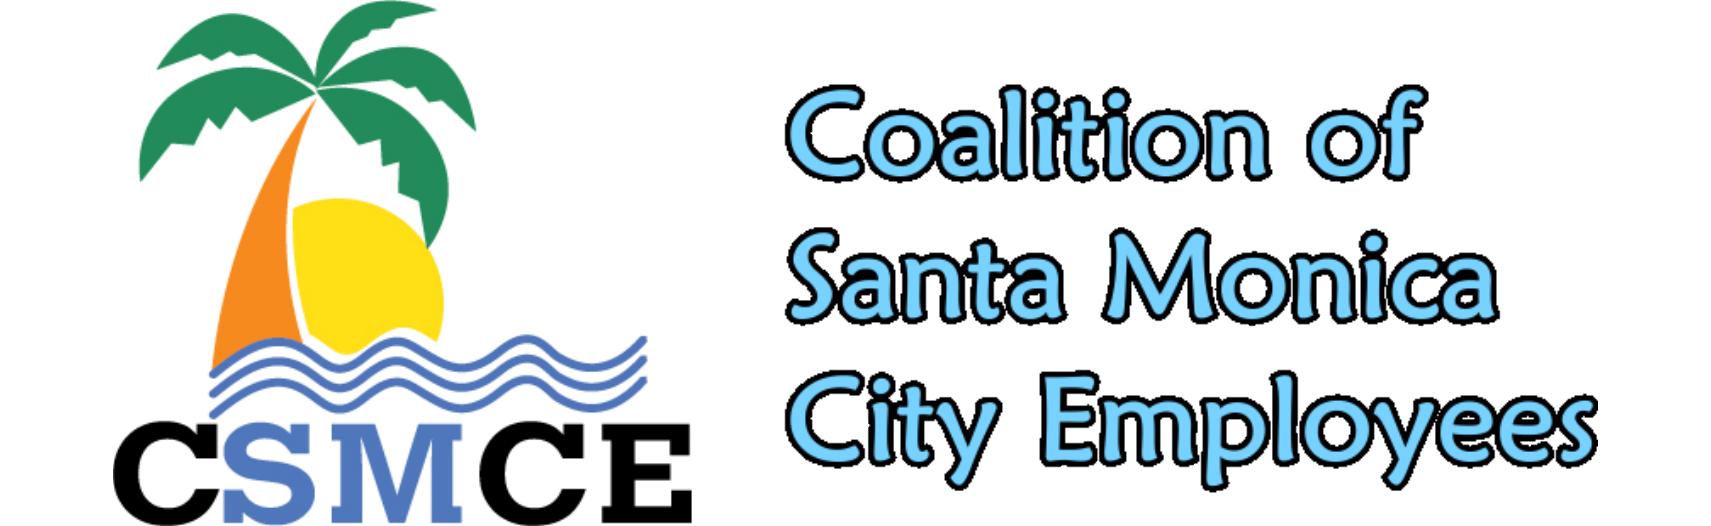 CSMCE logo